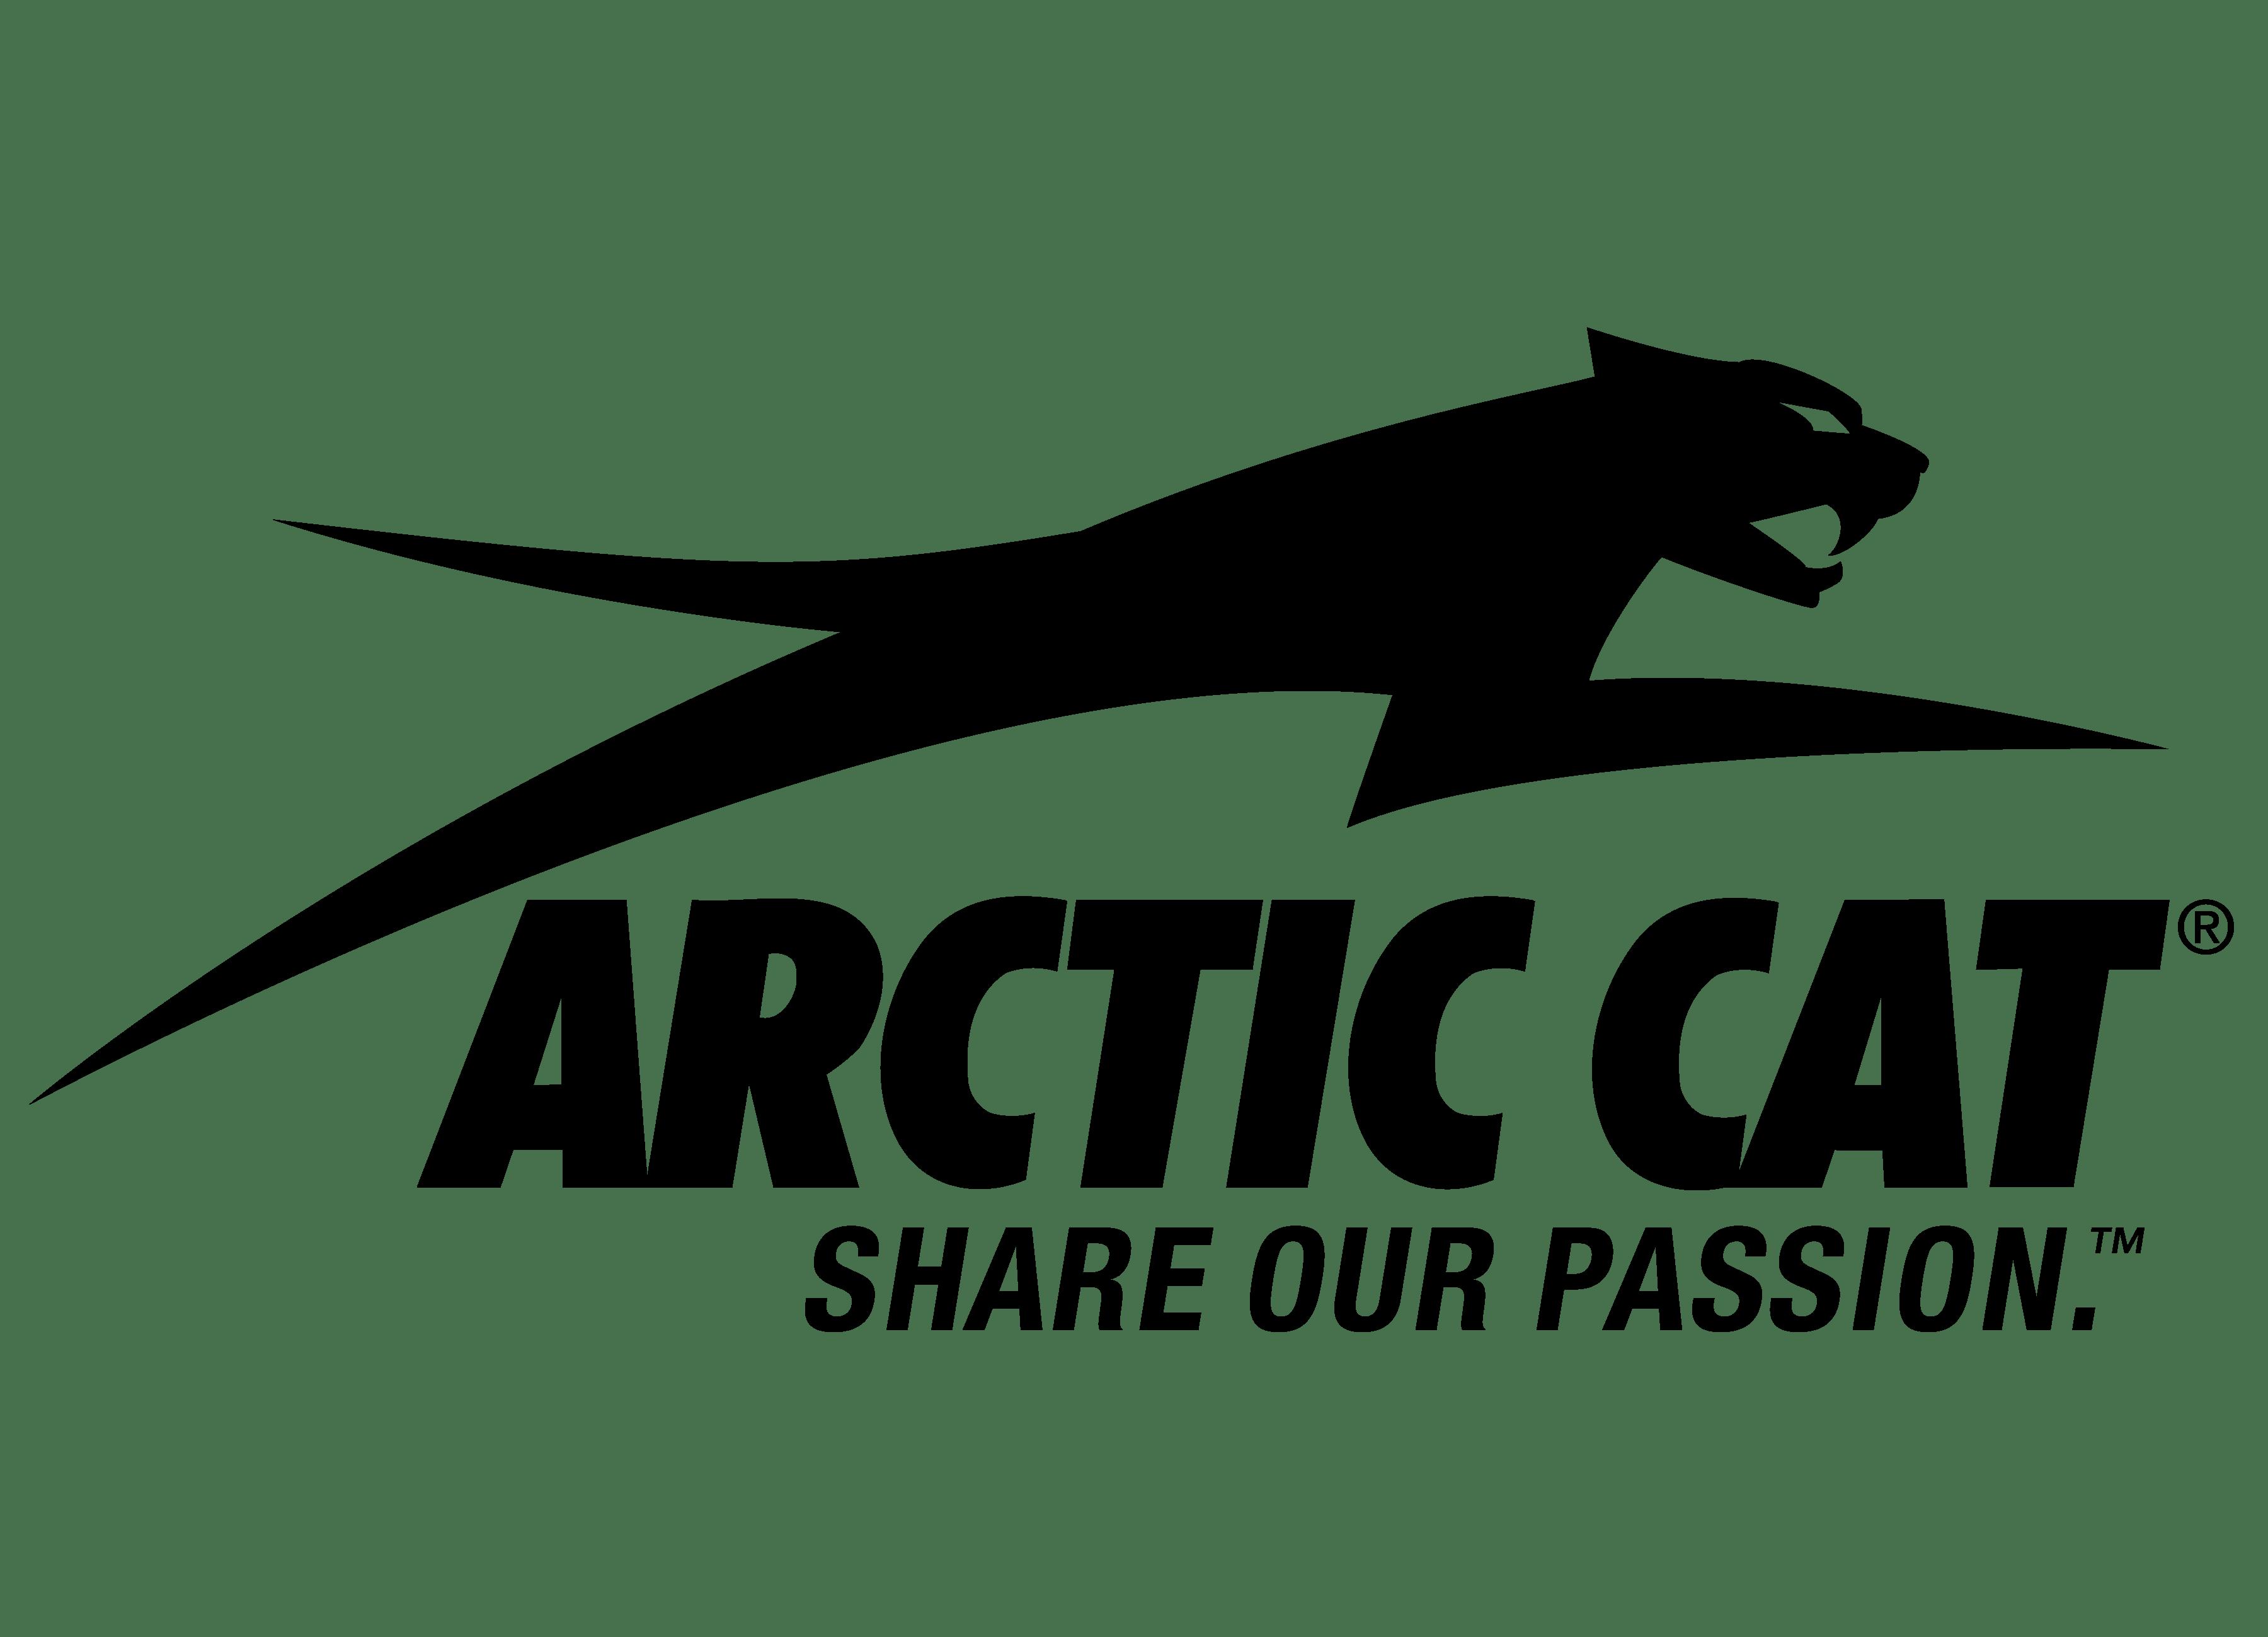 Arctic Cat Logo Cat logo, Motorcycle logo, Arctic